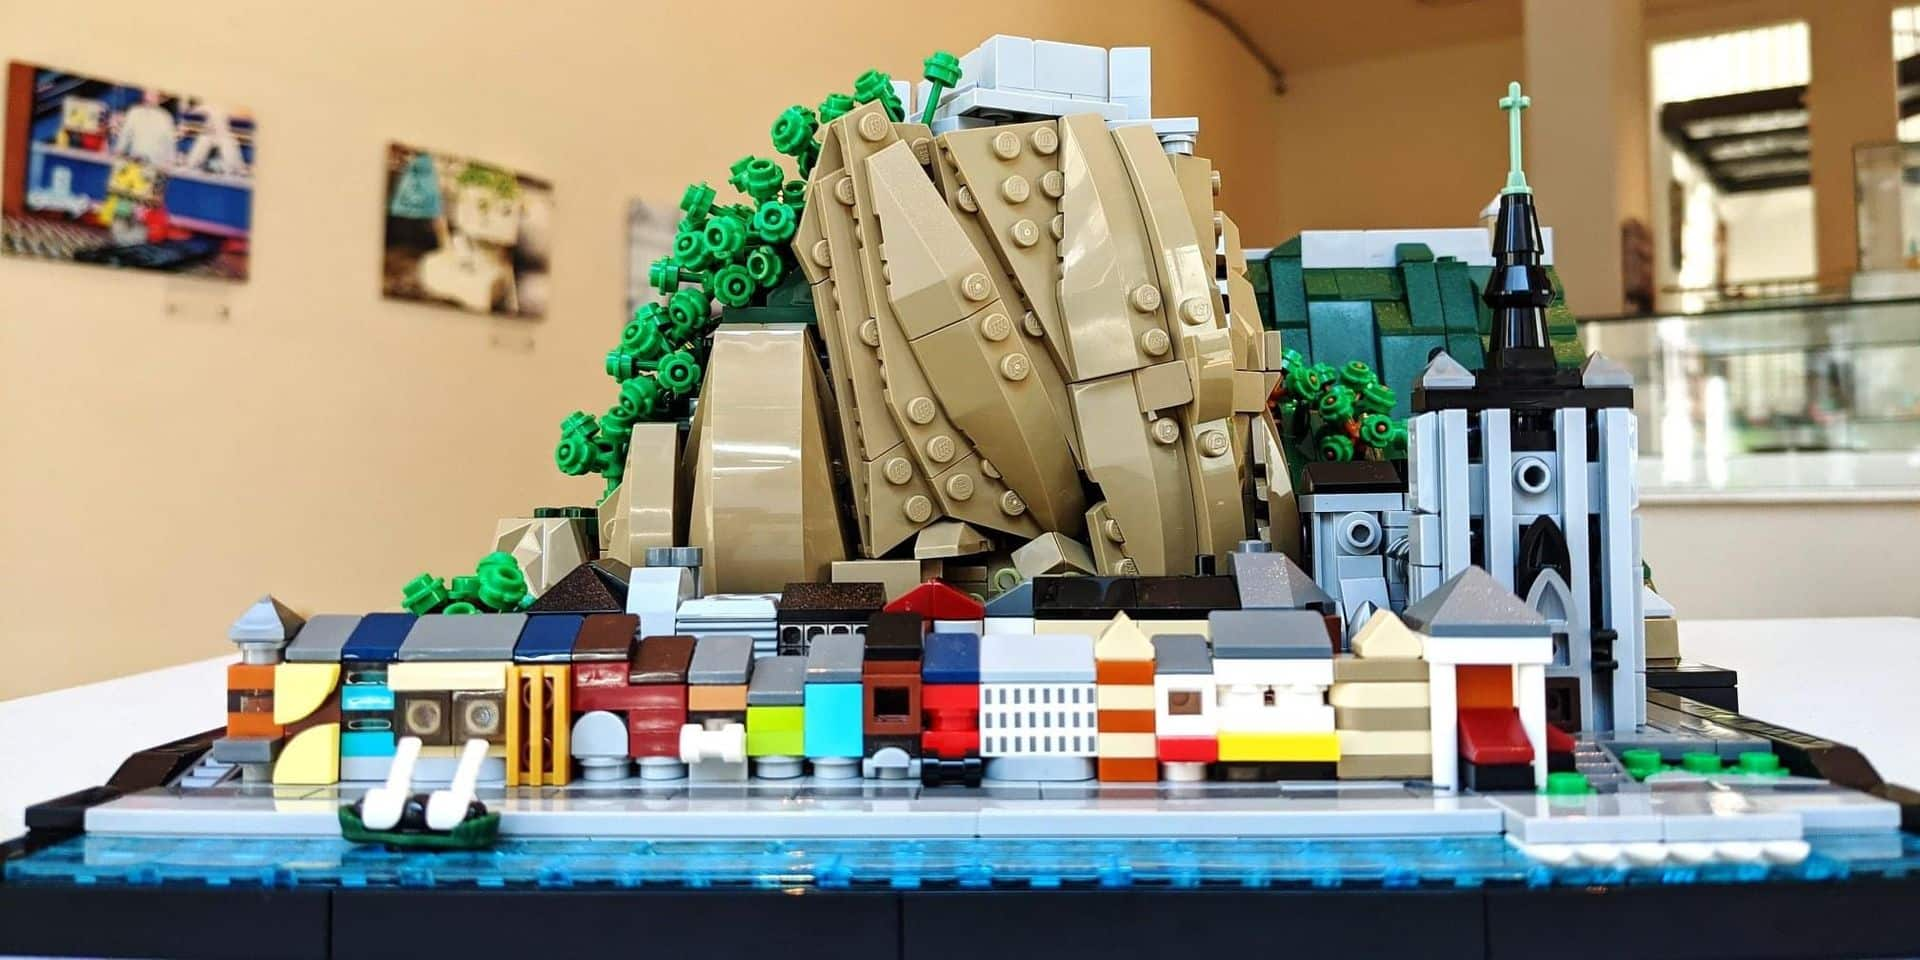 La sculpture de Dinant en Lego exposée au centre culturel